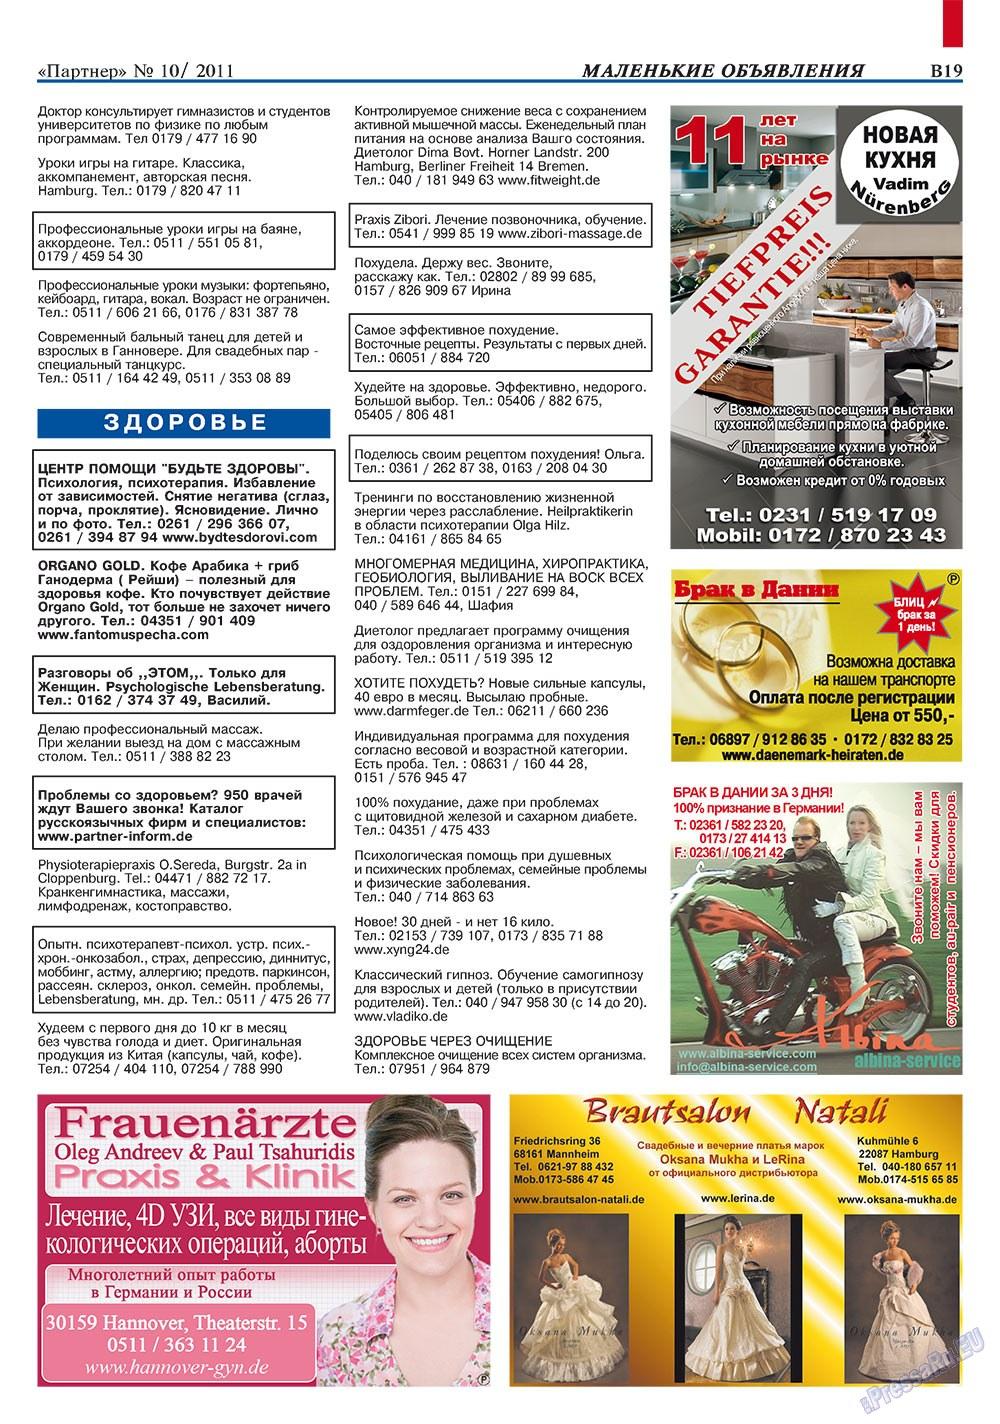 Партнер-север (журнал). 2011 год, номер 10, стр. 29